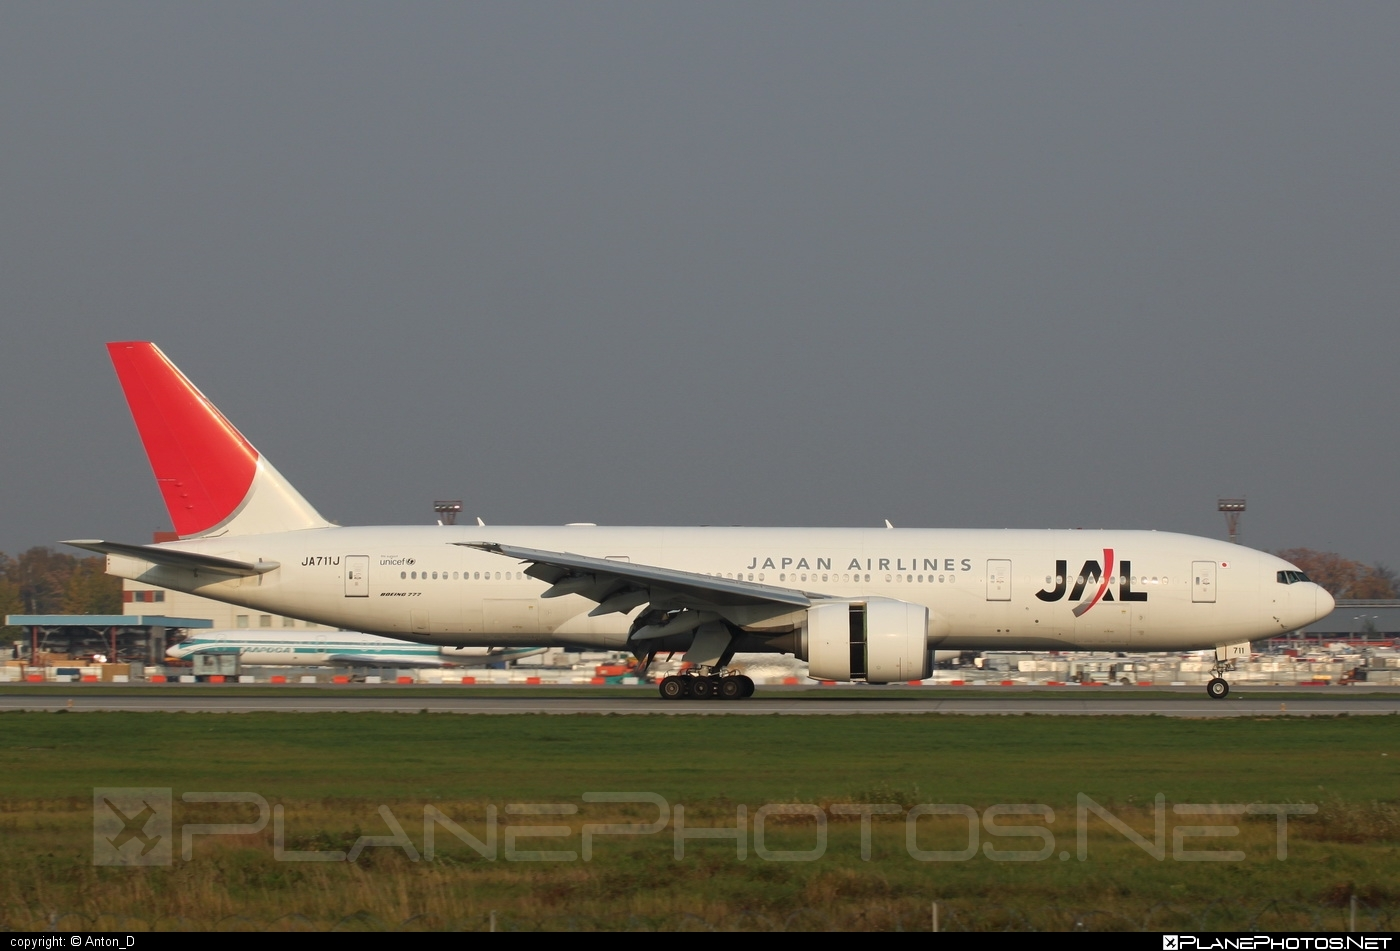 Boeing 777-200ER - JA711J operated by Japan Airlines (JAL) #b777 #b777er #boeing #boeing777 #tripleseven